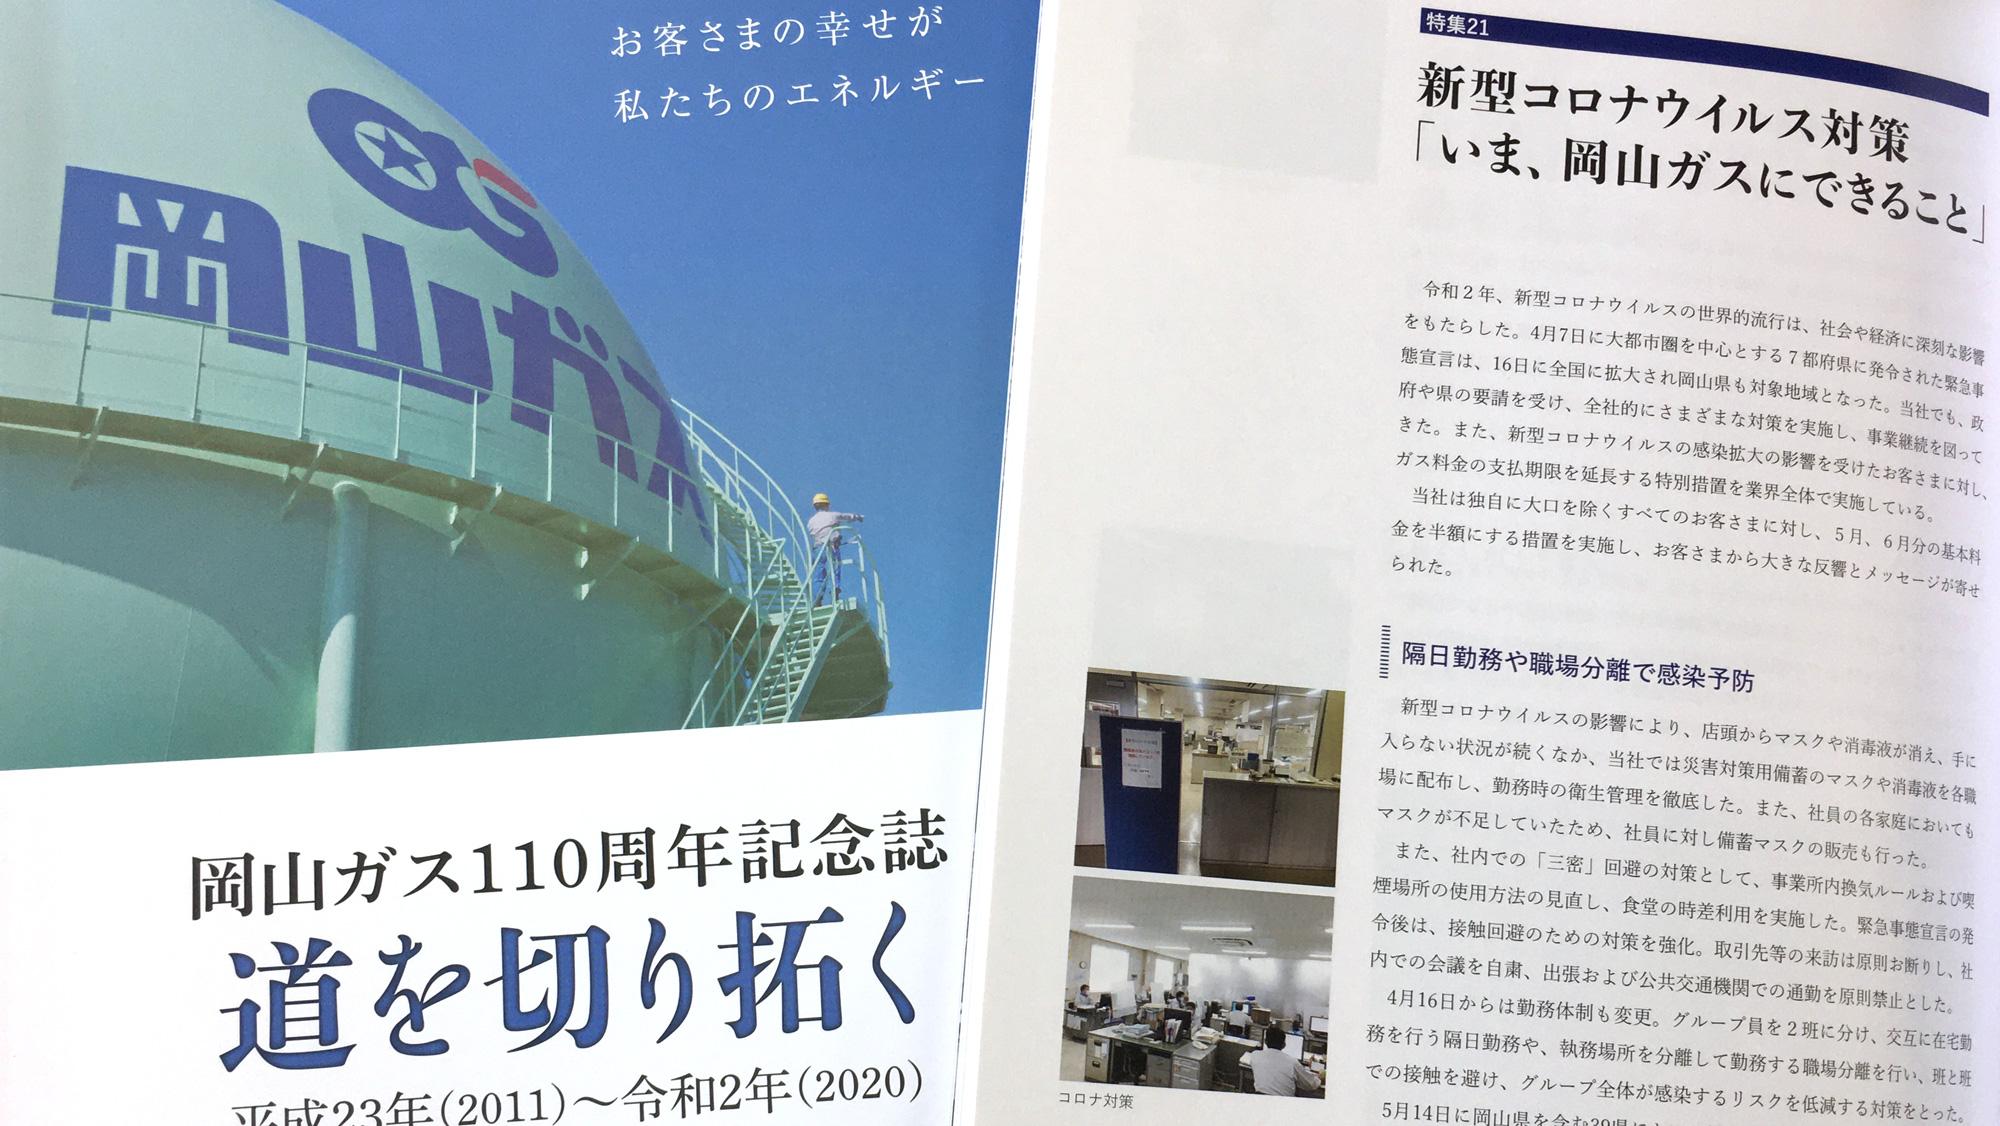 岡山ガス株式会社110周年記念誌